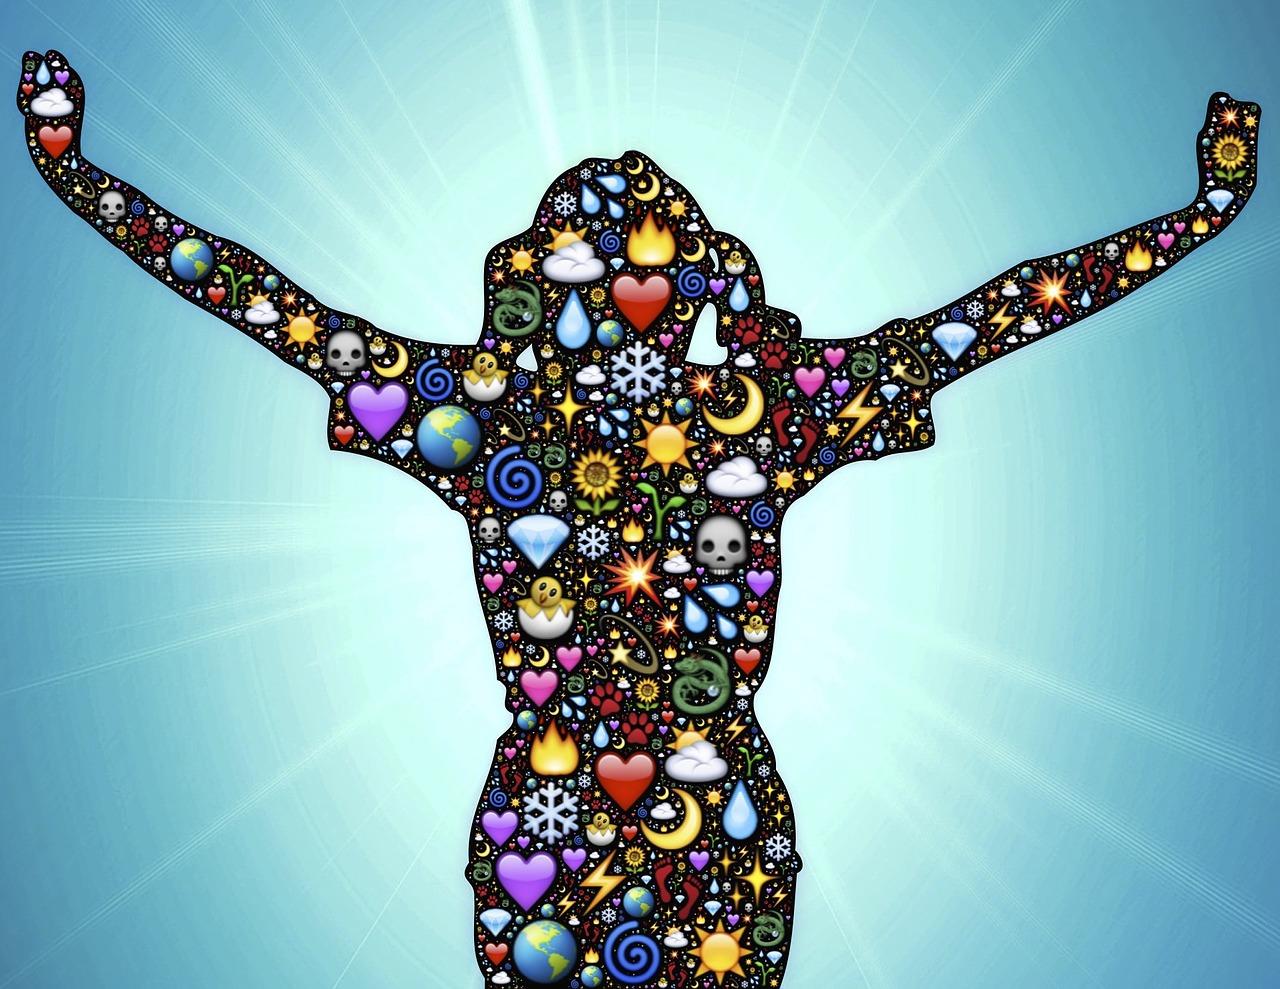 Recharging, Rejuvenation, Reclamation: The Art of Letting Go